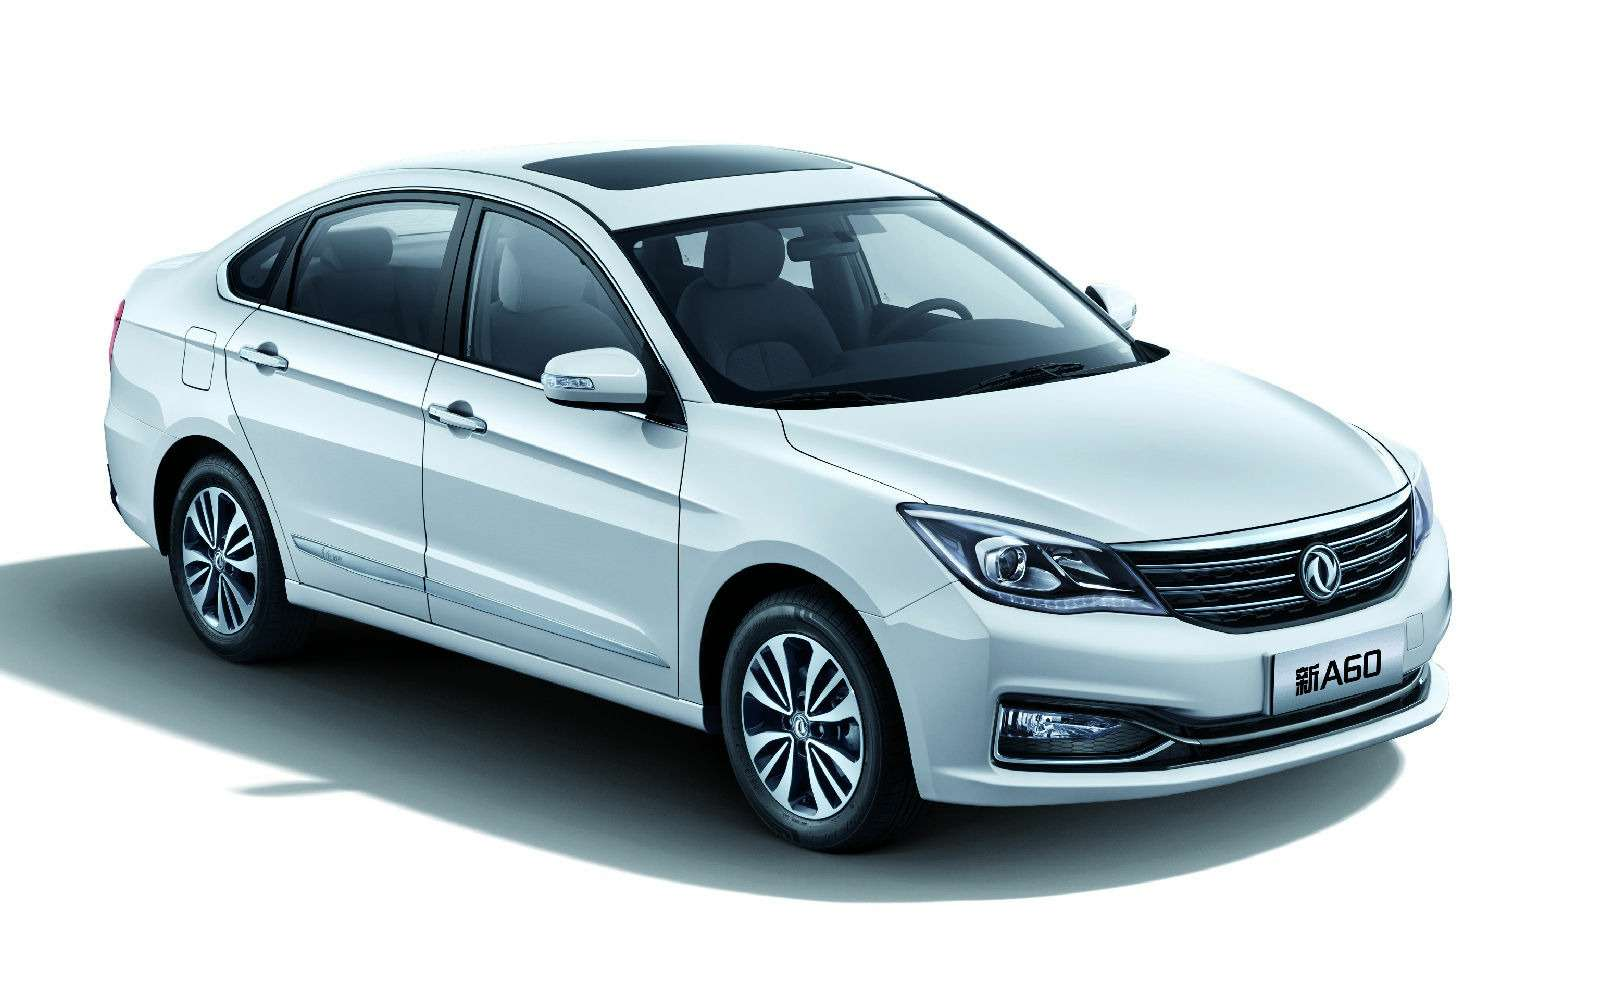 Dongfeng покажет наММАС два компактных седана— фото 623010